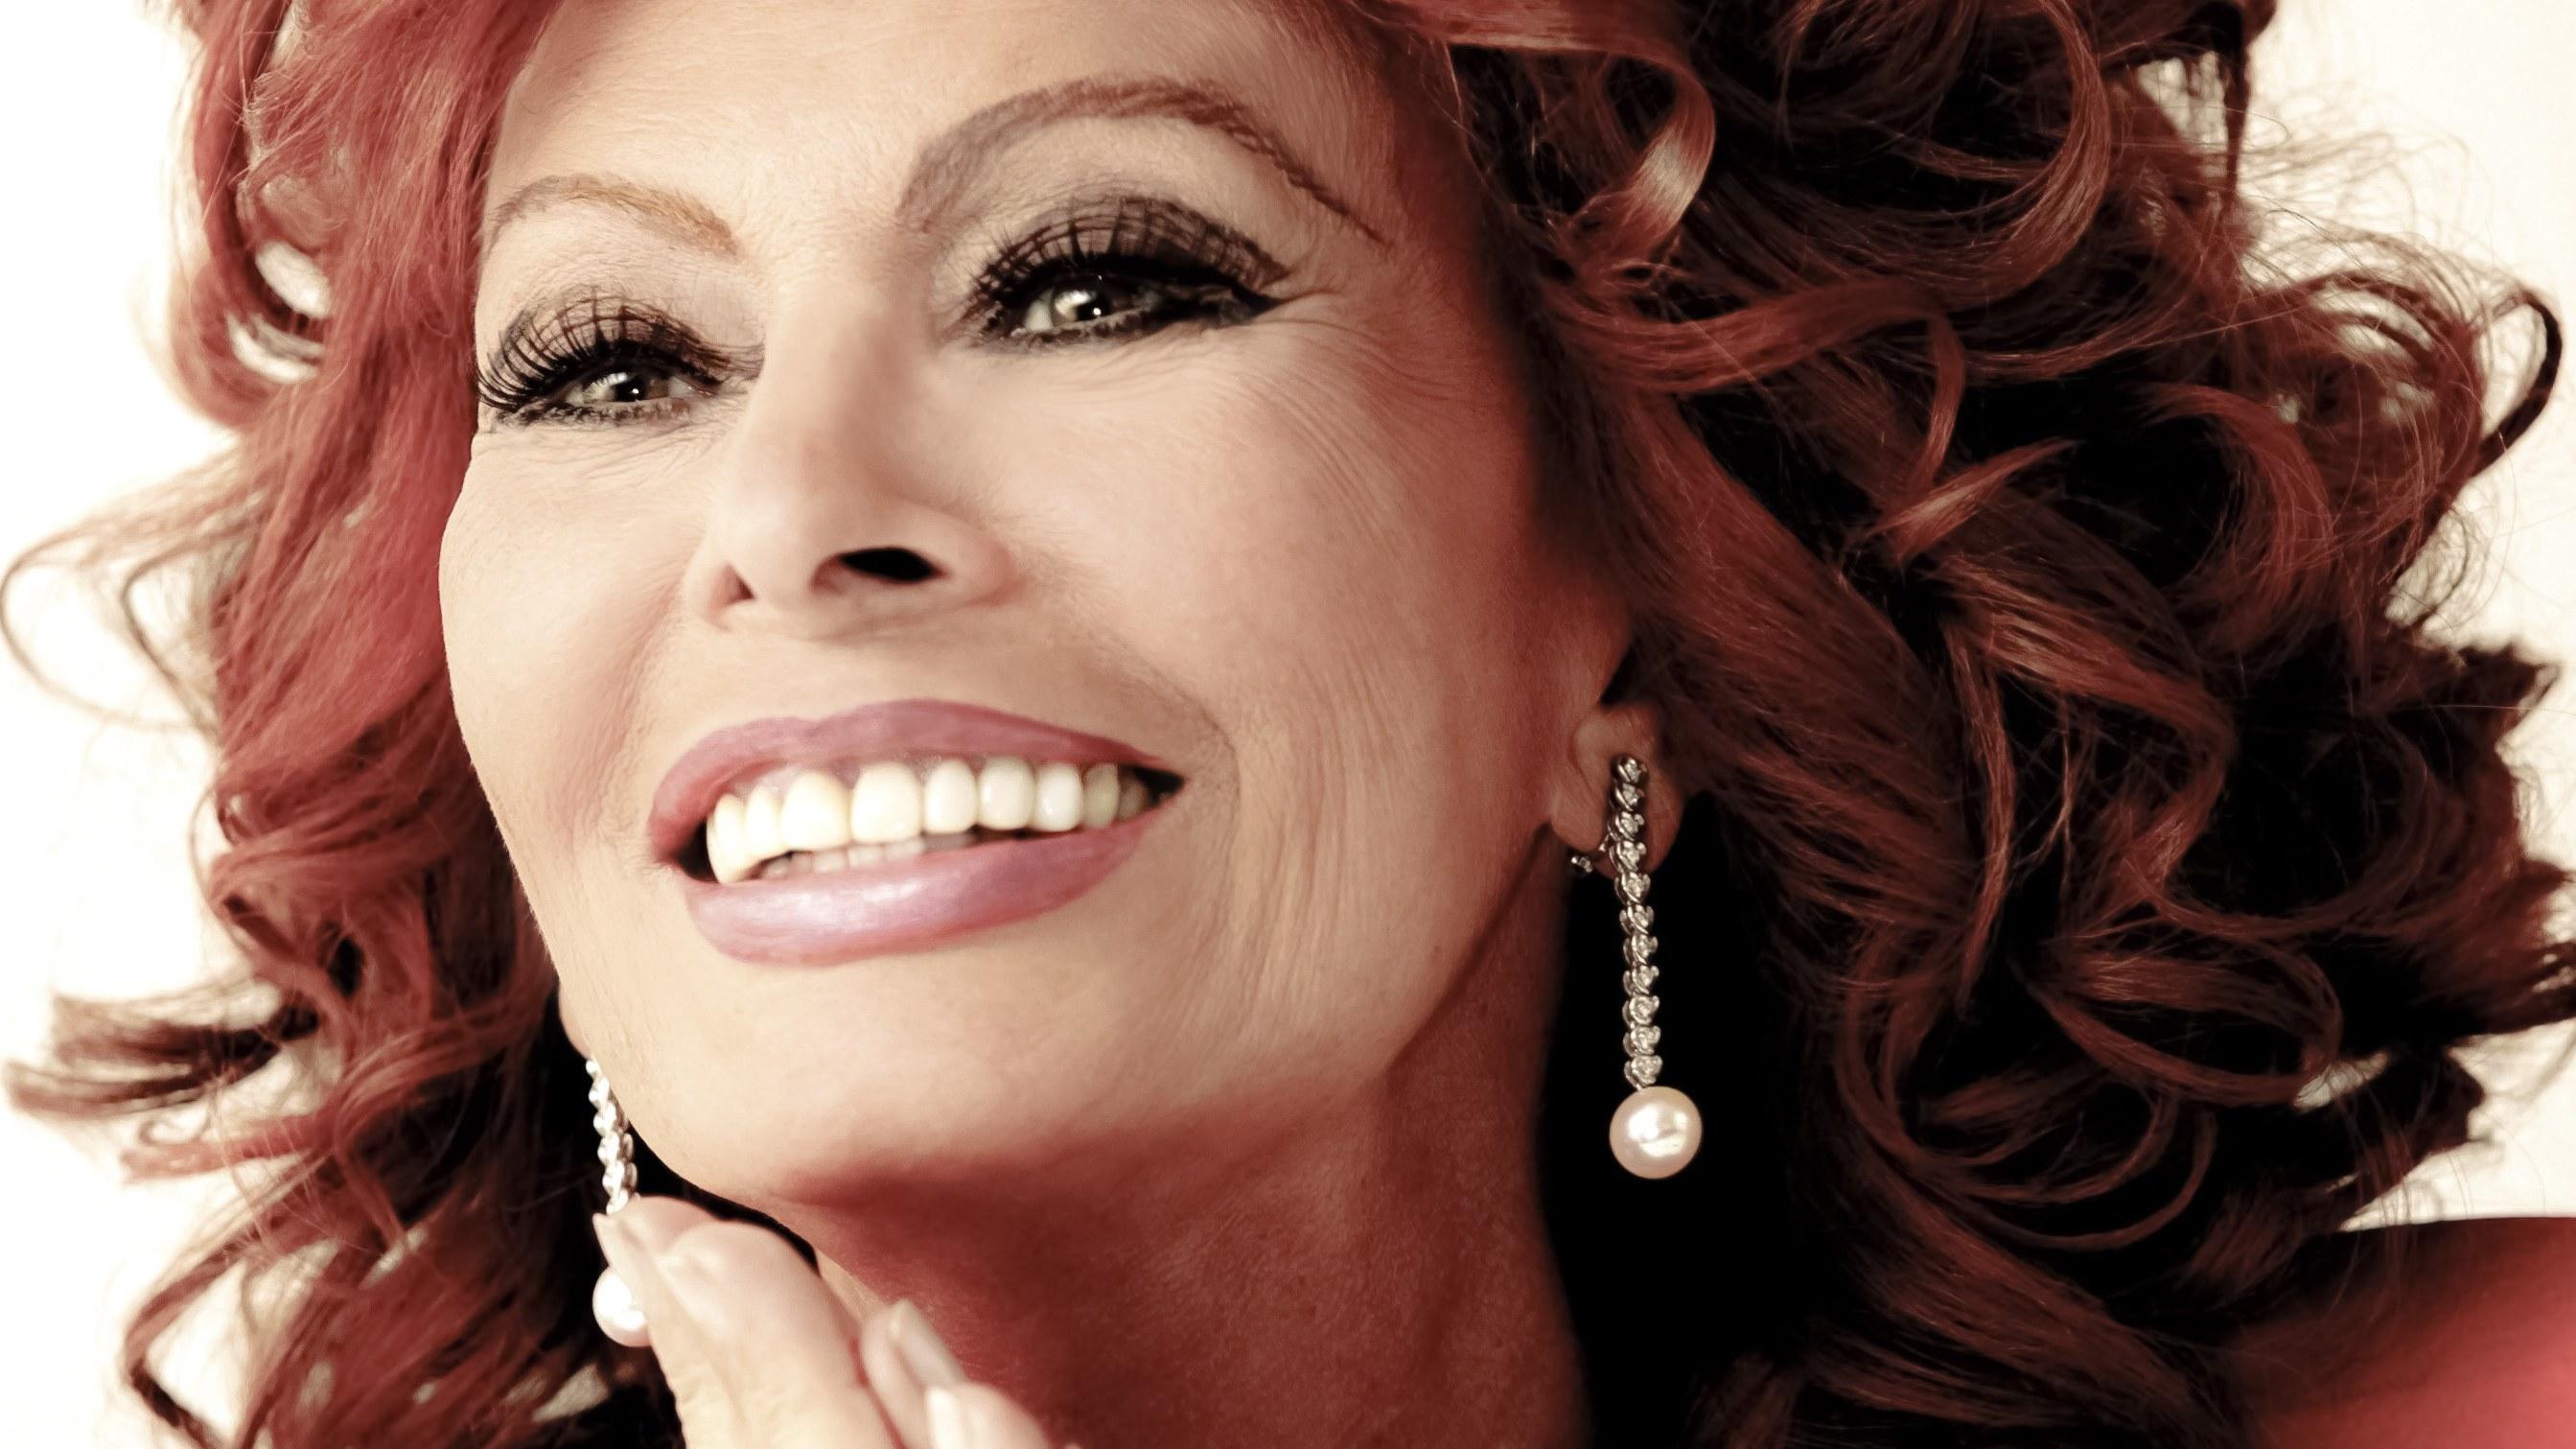 Sophia Loren on Life, Aging, and Leonardo DiCaprio | W Magazine